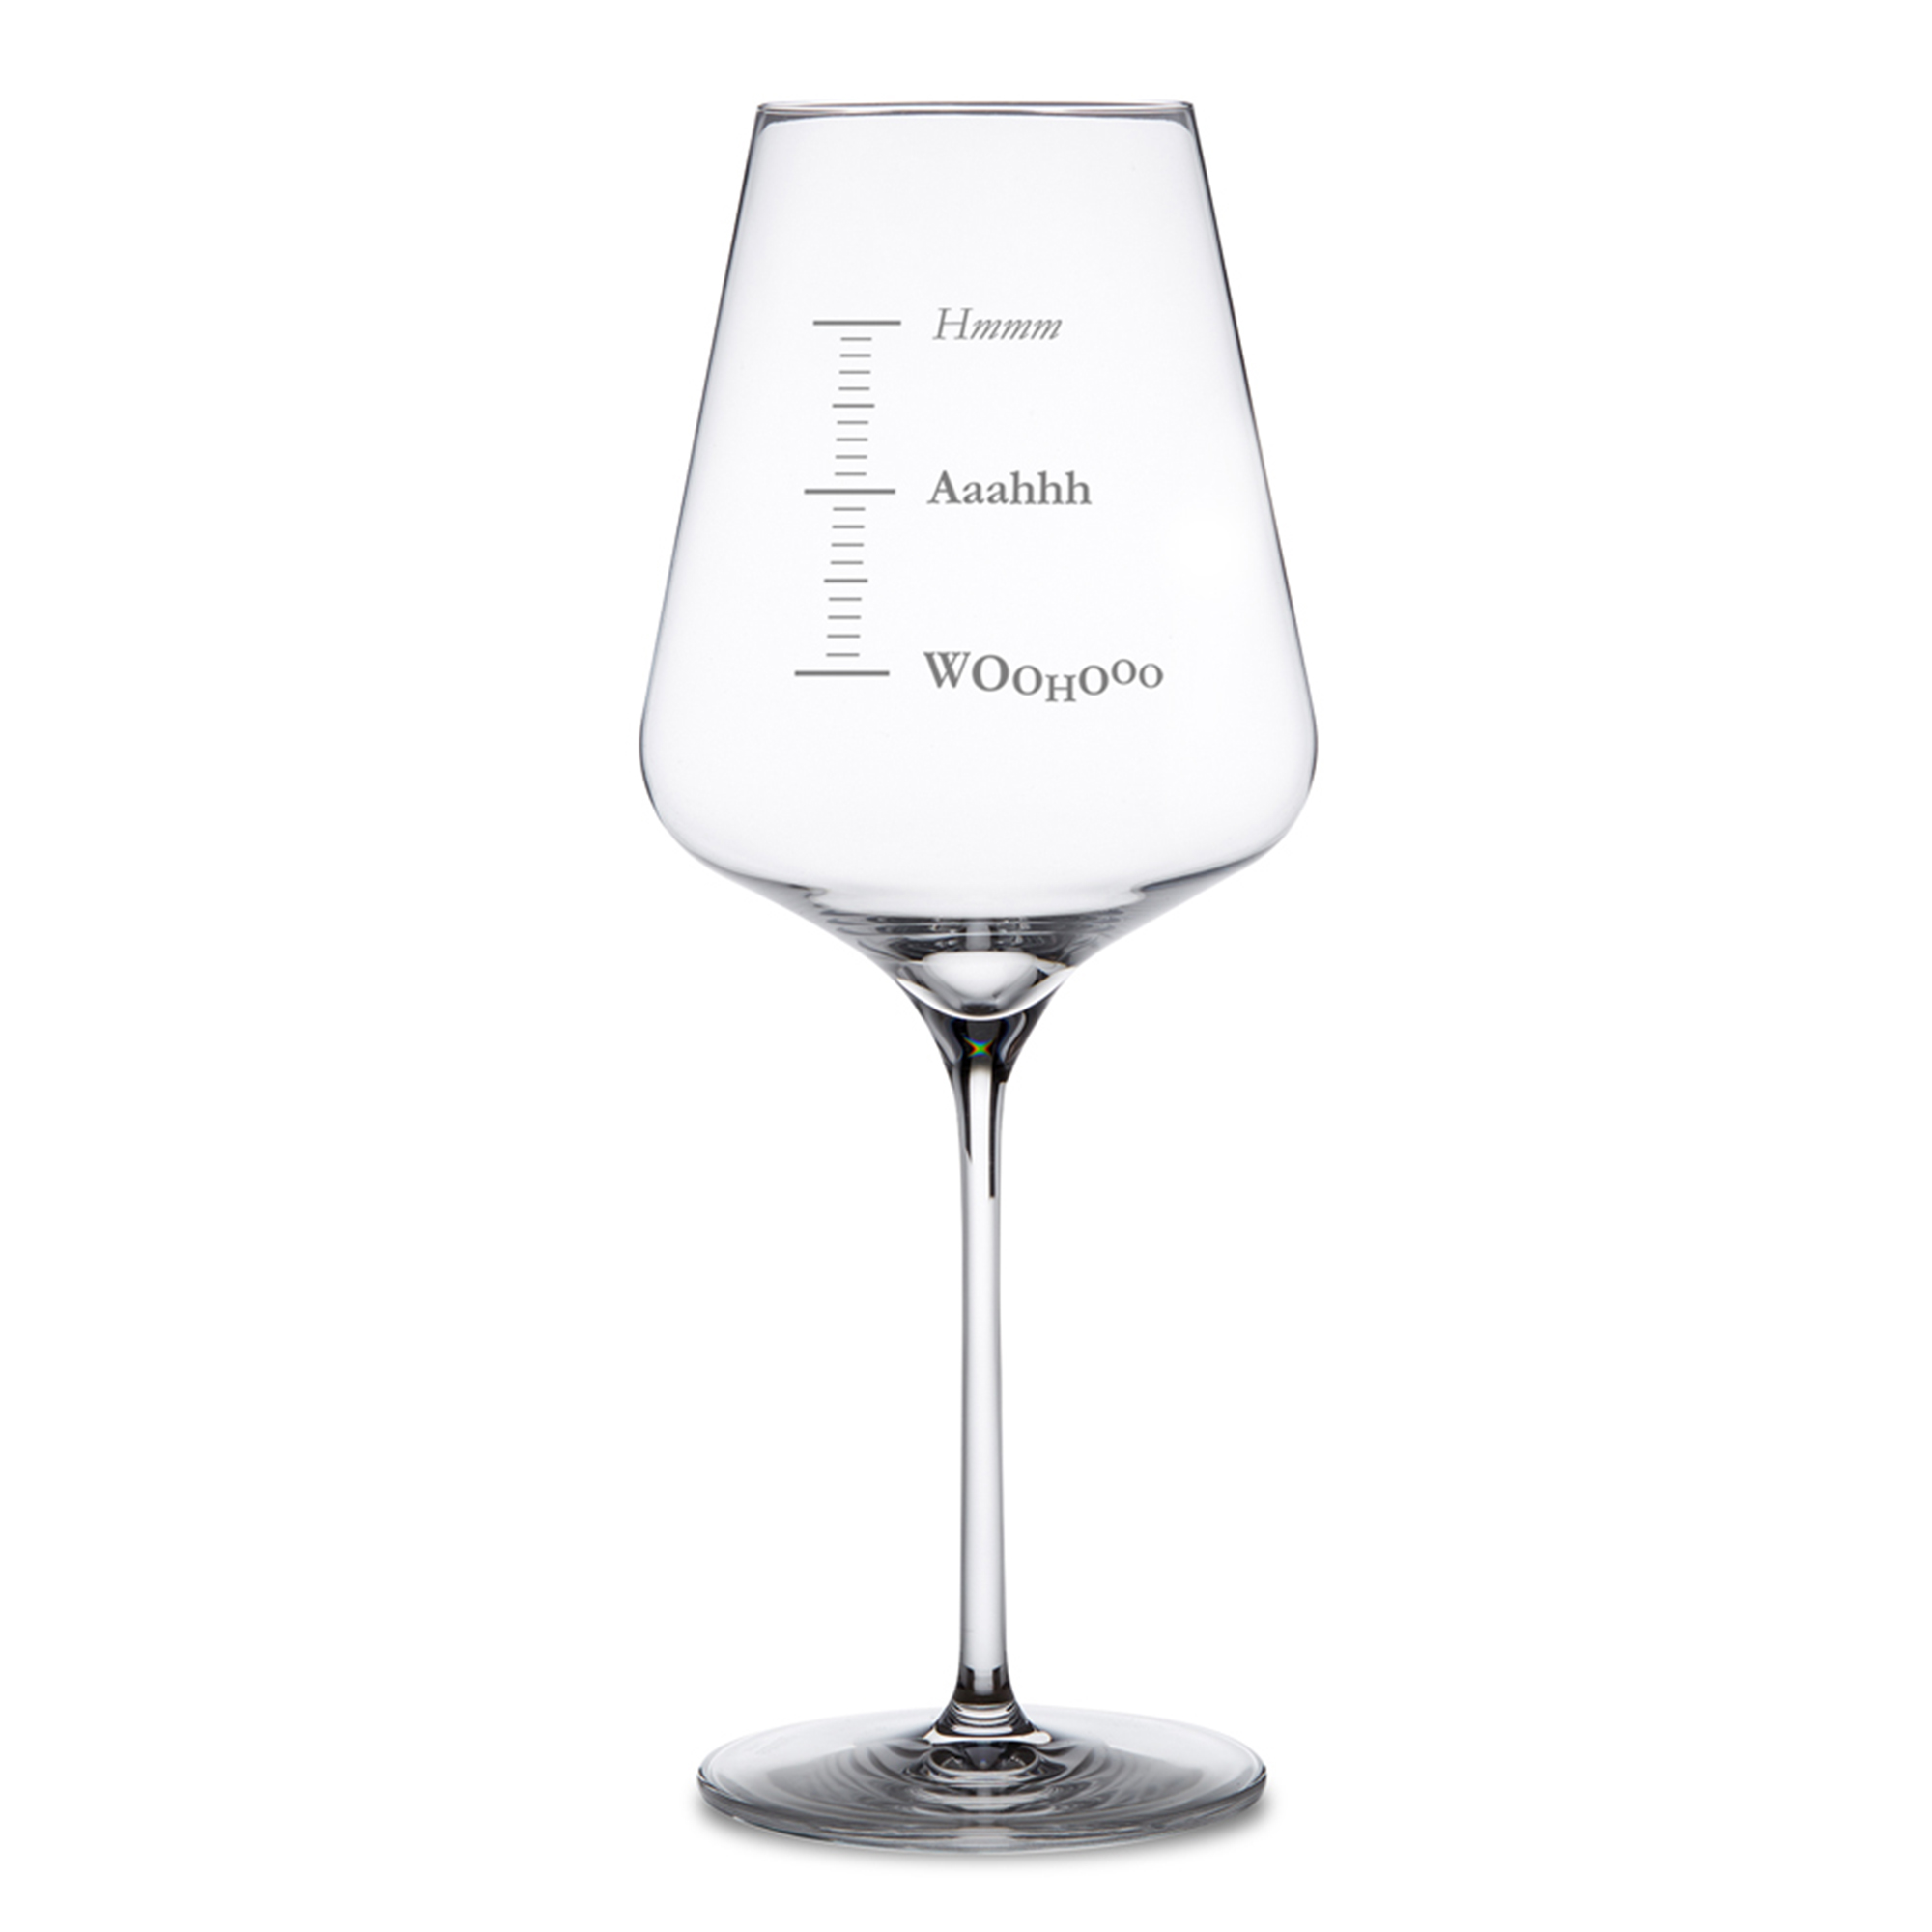 Weinglas mit Gravur - Woohooo - 2